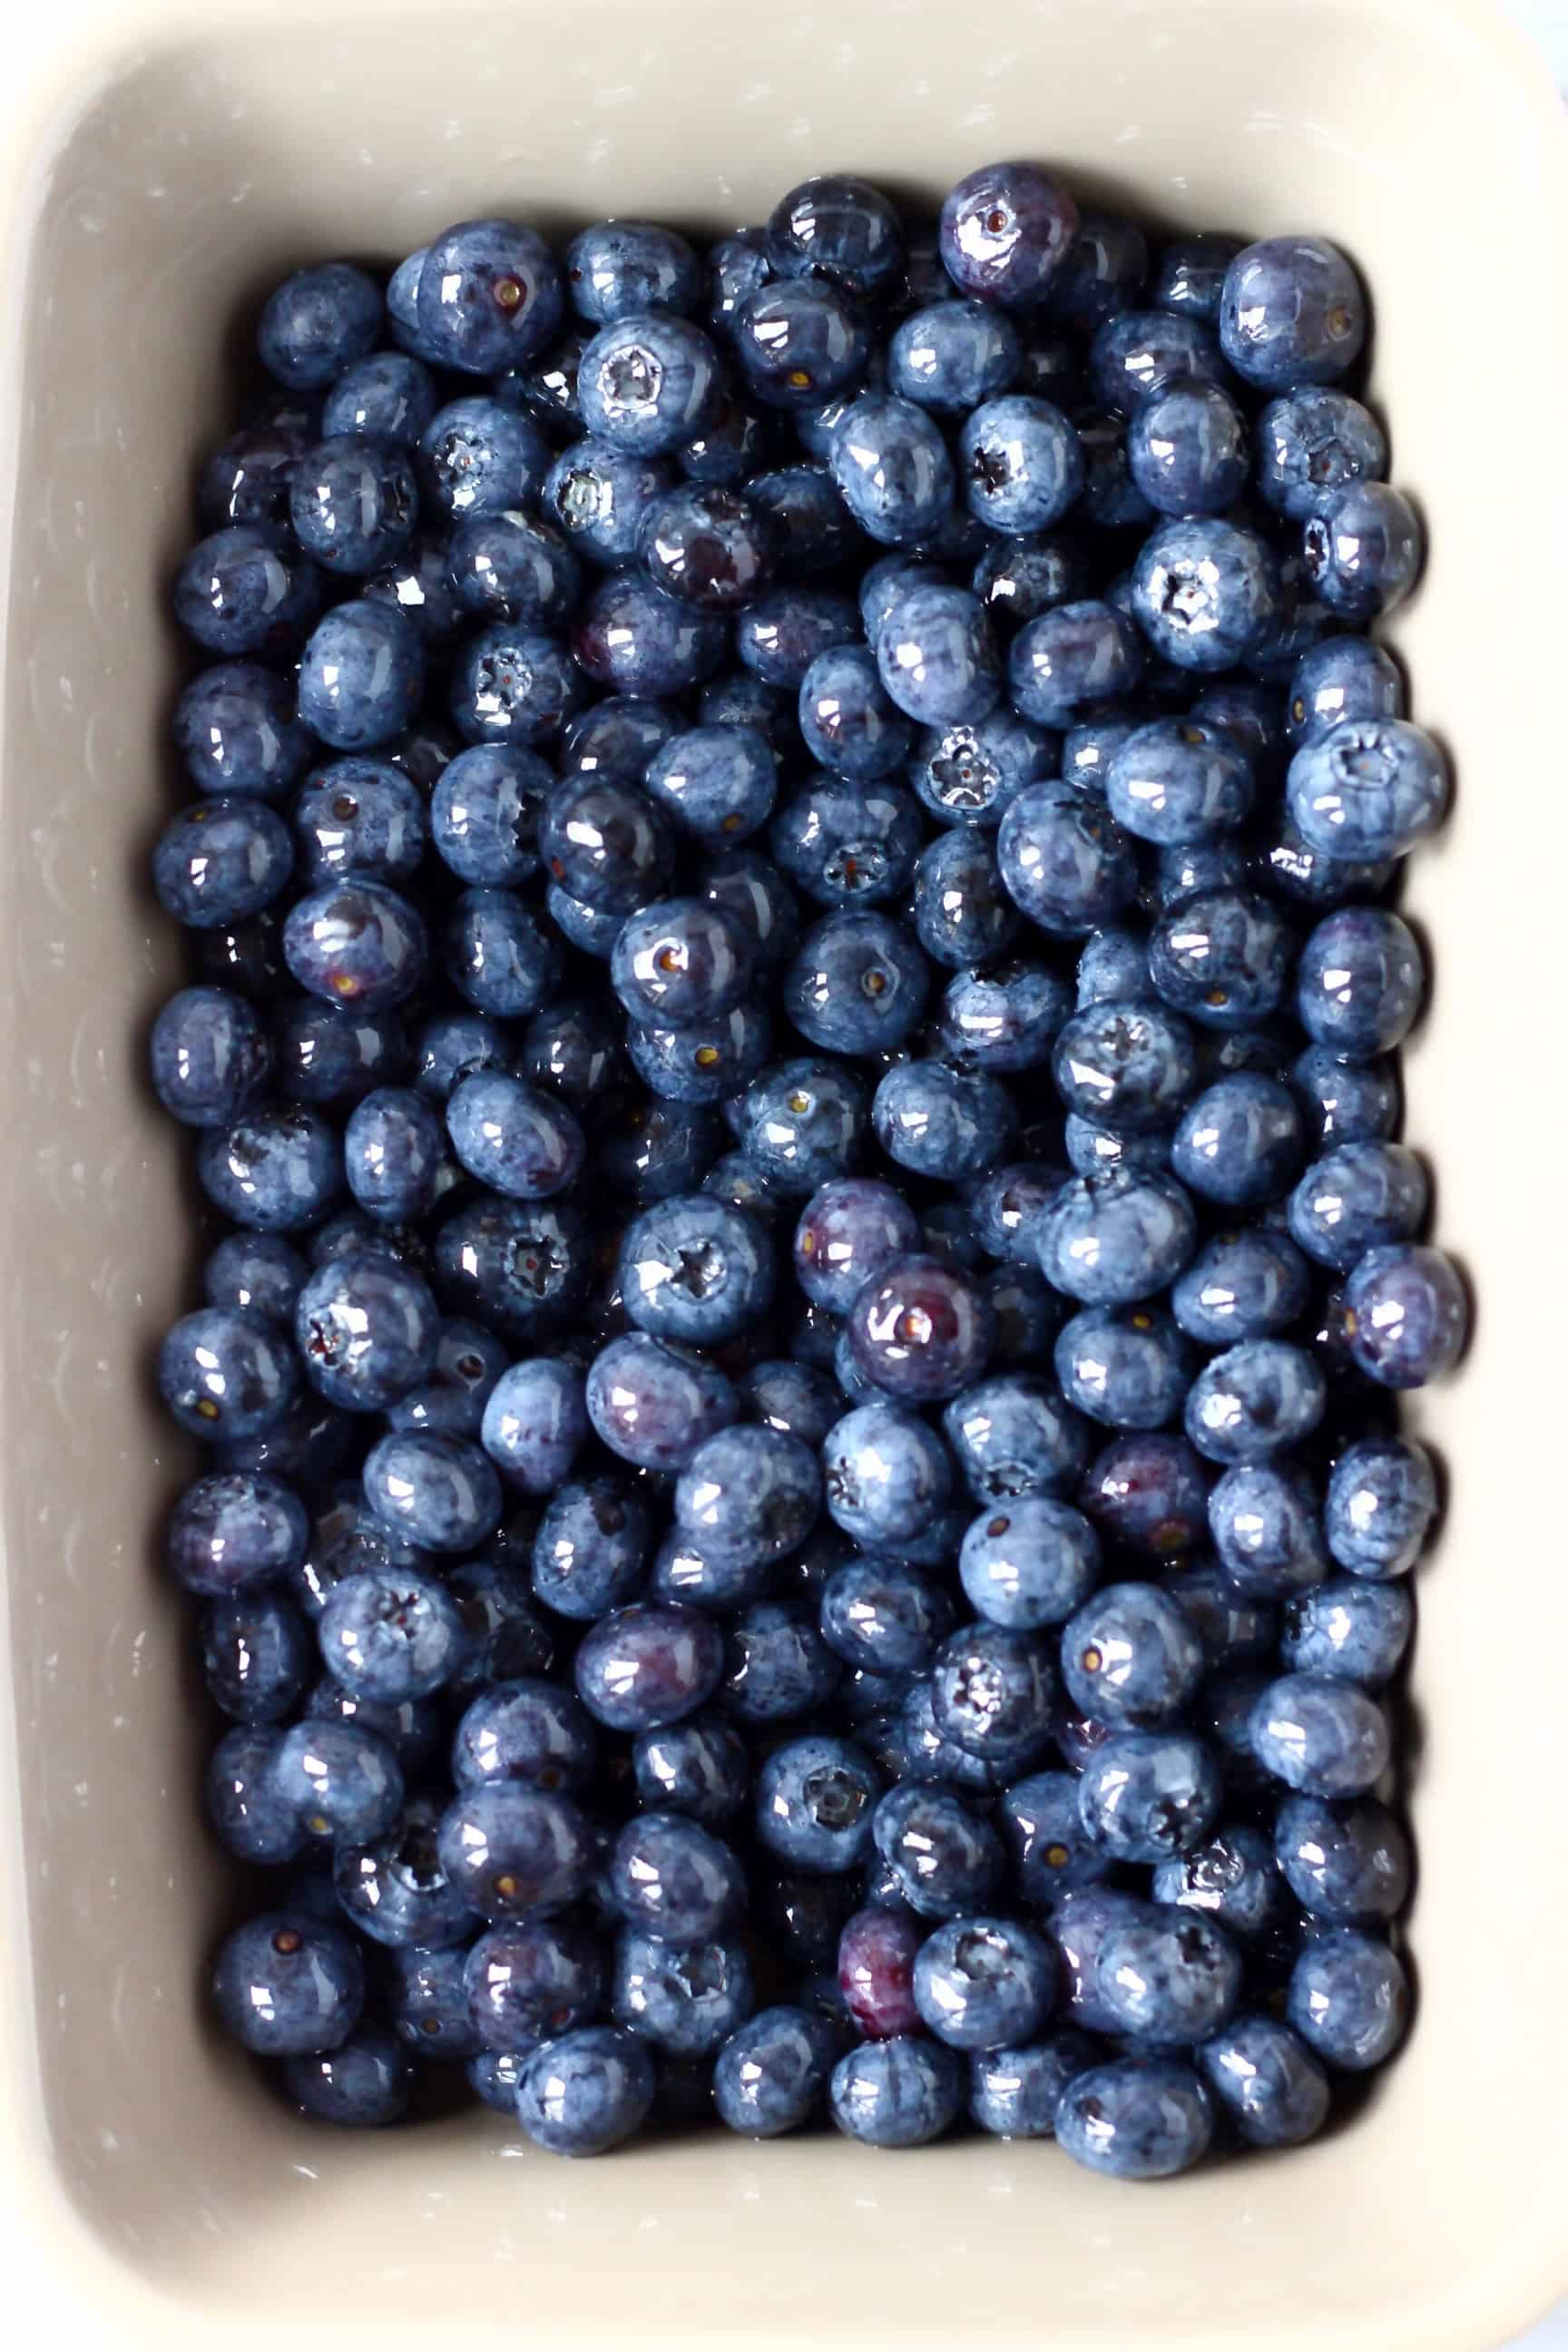 Blueberries in a grey rectangular baking dish